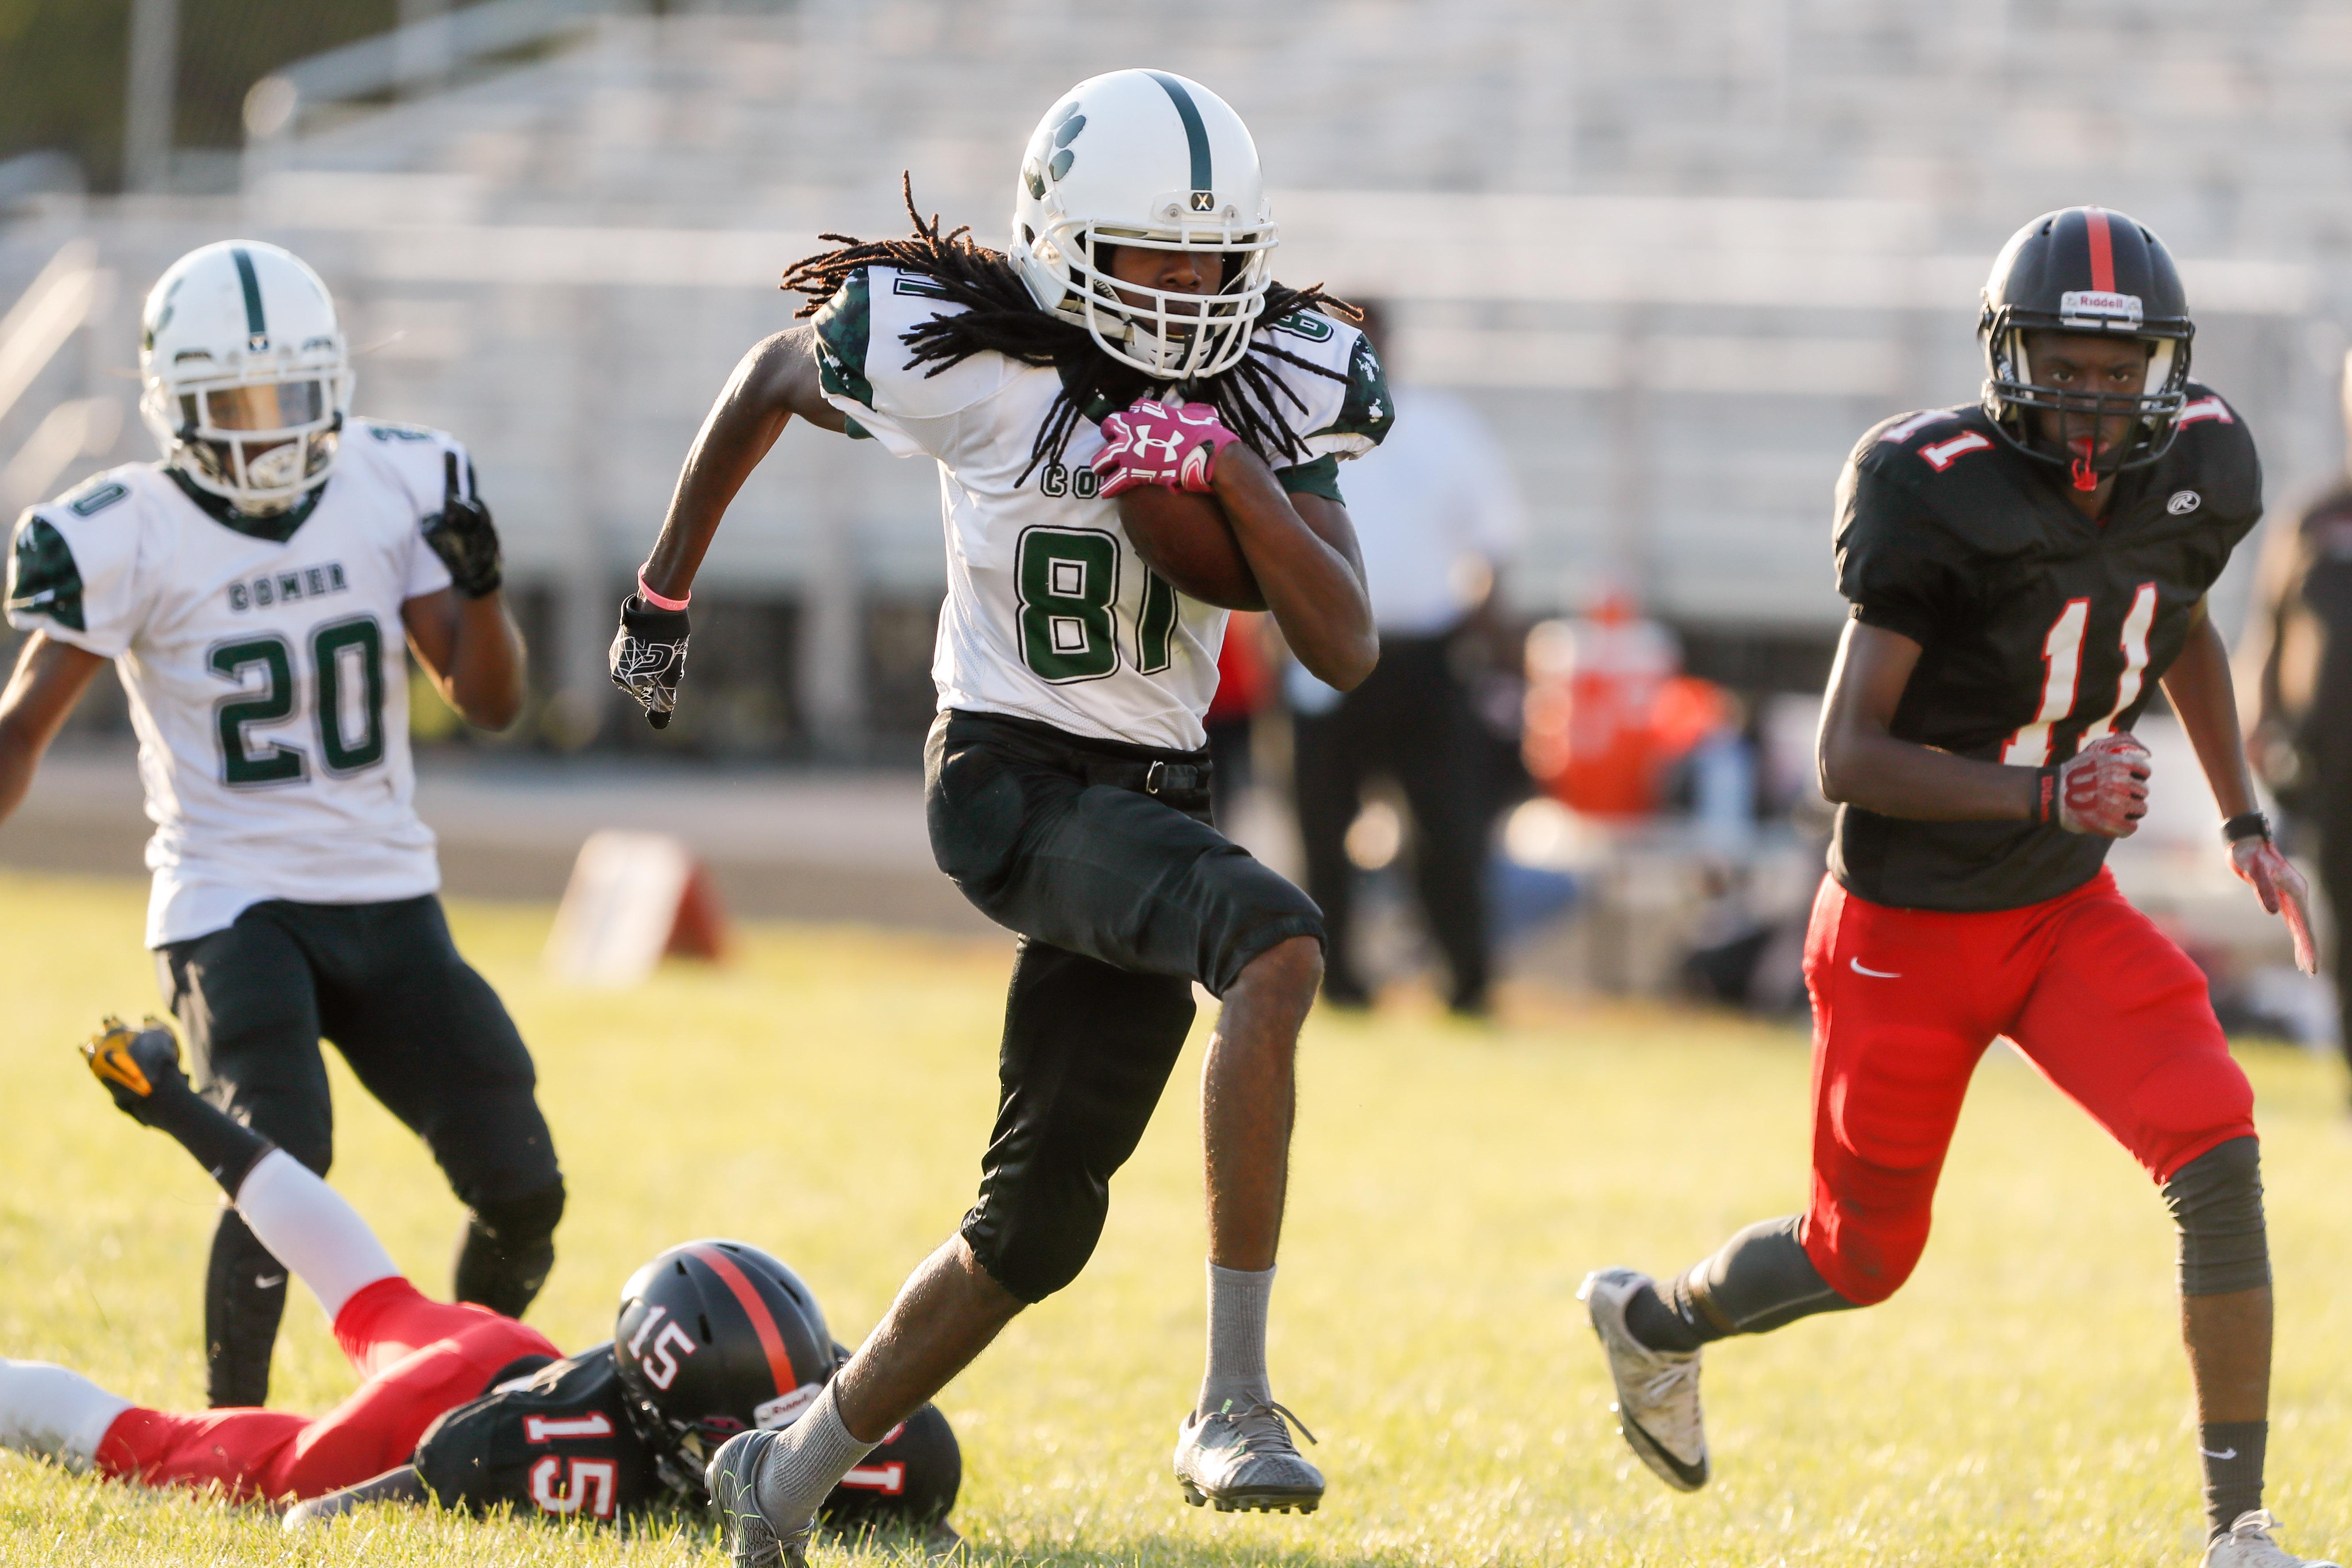 Comer's Dante Knight-Little (81) breaks away to score a touchdown against DuSable.